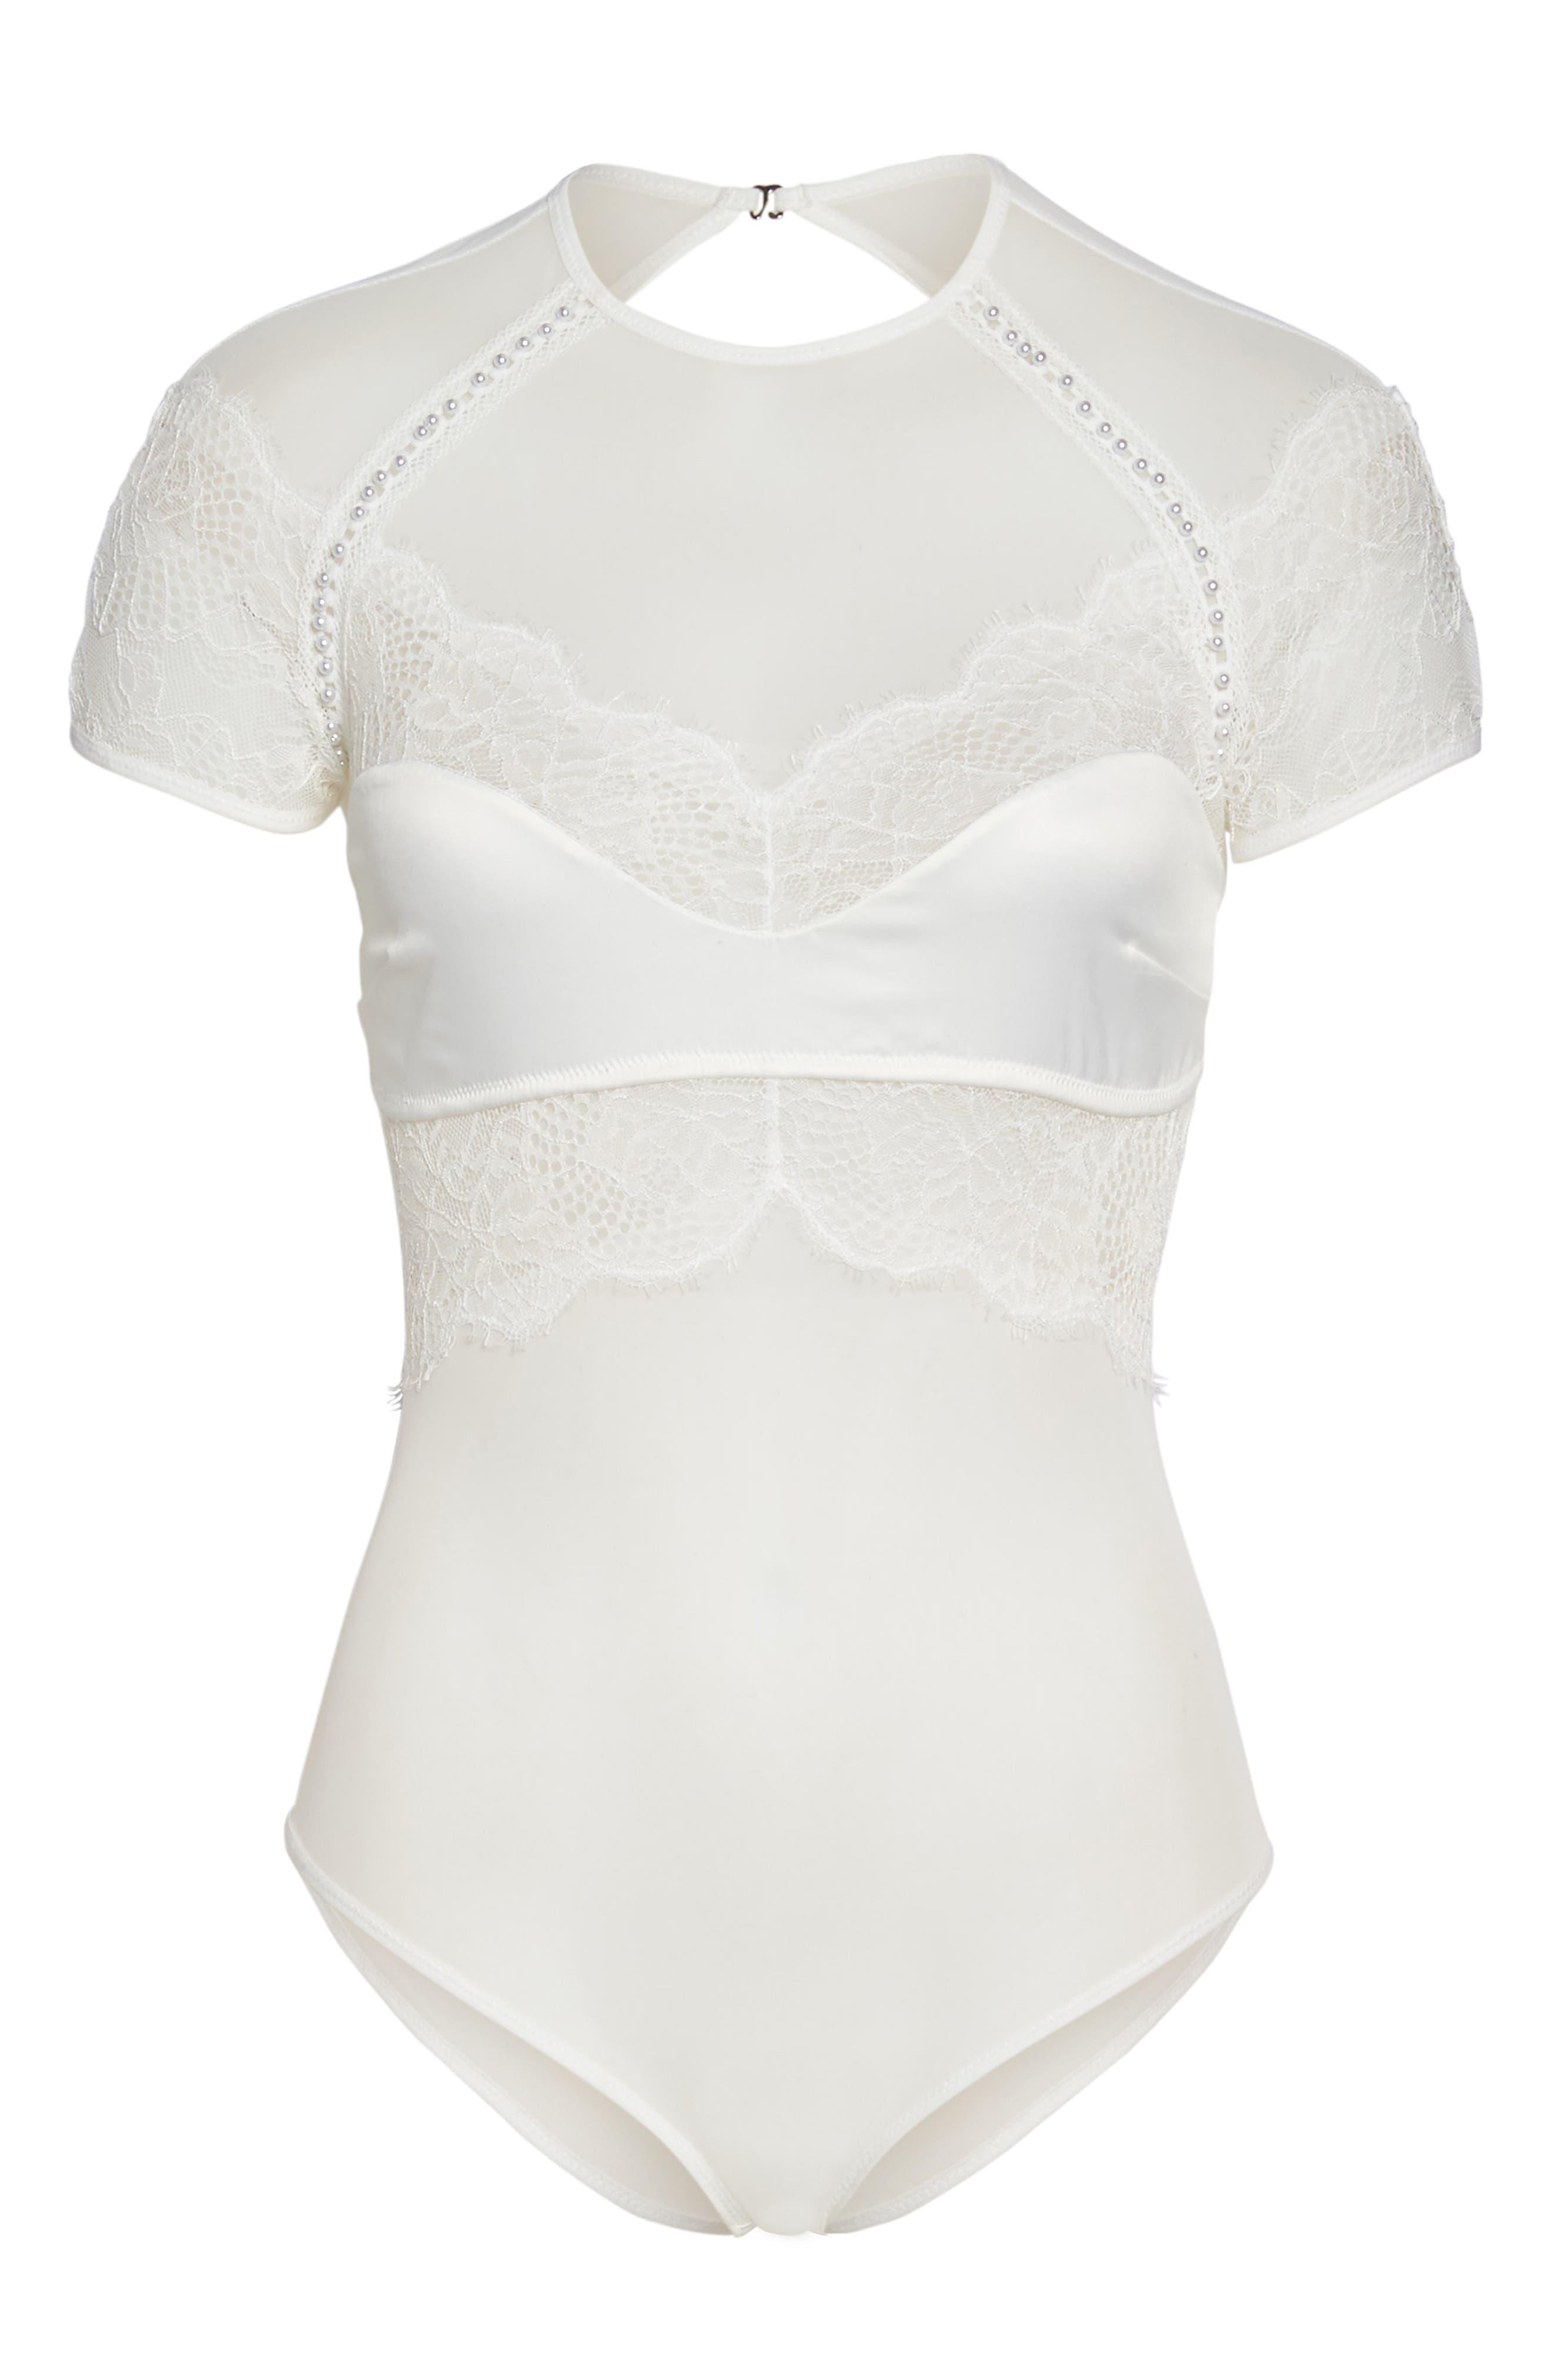 Thistle & Spire Sterling Embellished Bodysuit,                             Alternate thumbnail 6, color,                             900